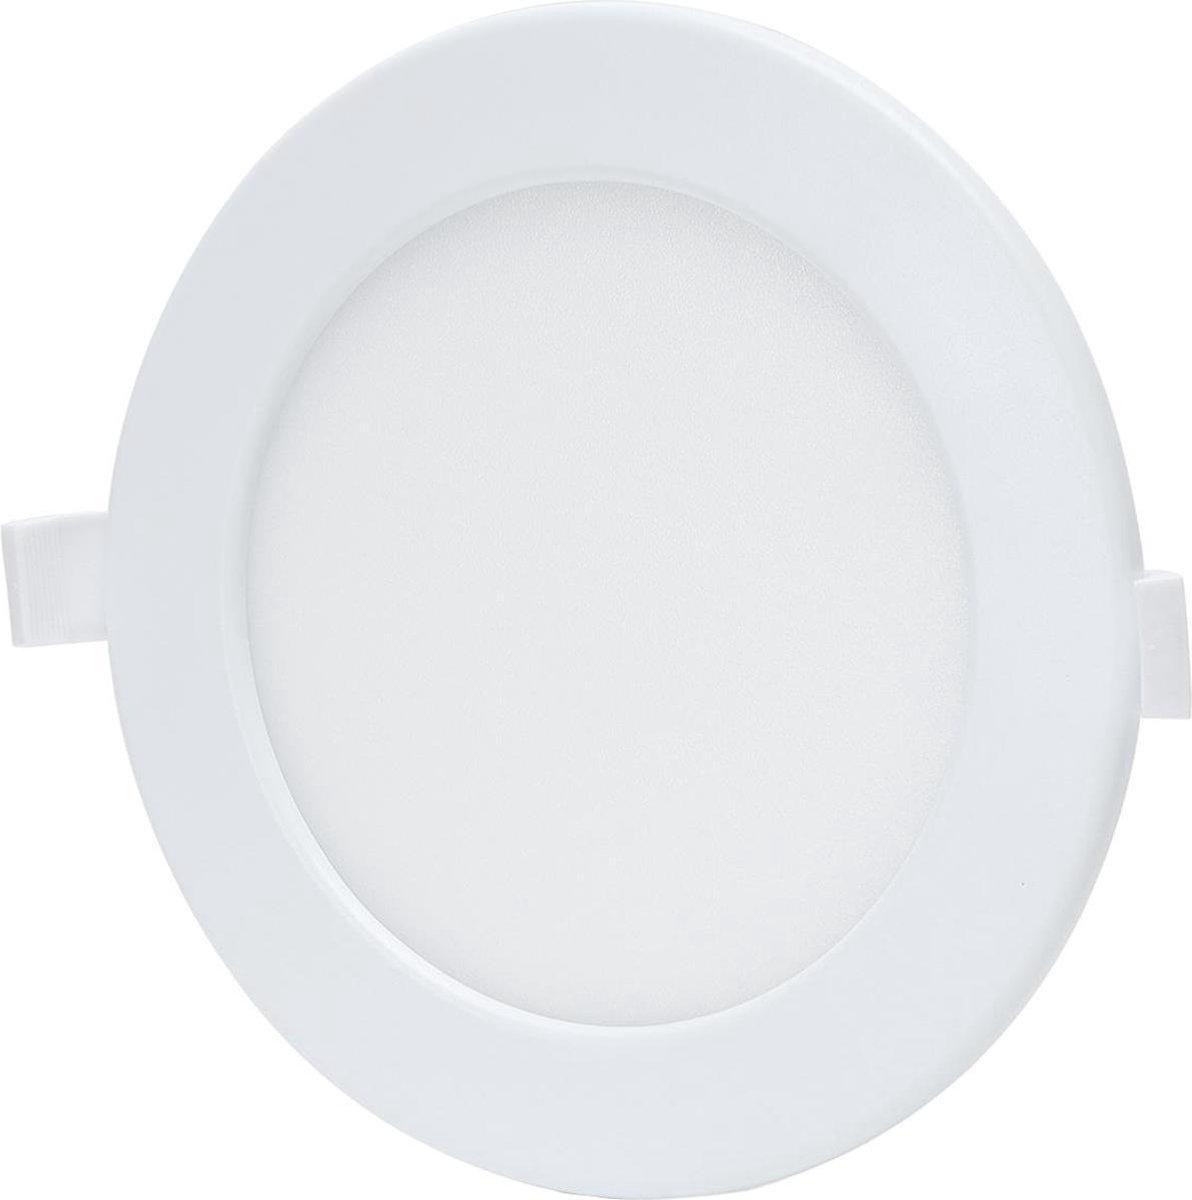 LED Downlight - Smart LED - Aigi Zumba - 12W - Aanpasbare Kleur - Inbouw Rond - Mat Wit - Aluminium - Ø160mm - BSE